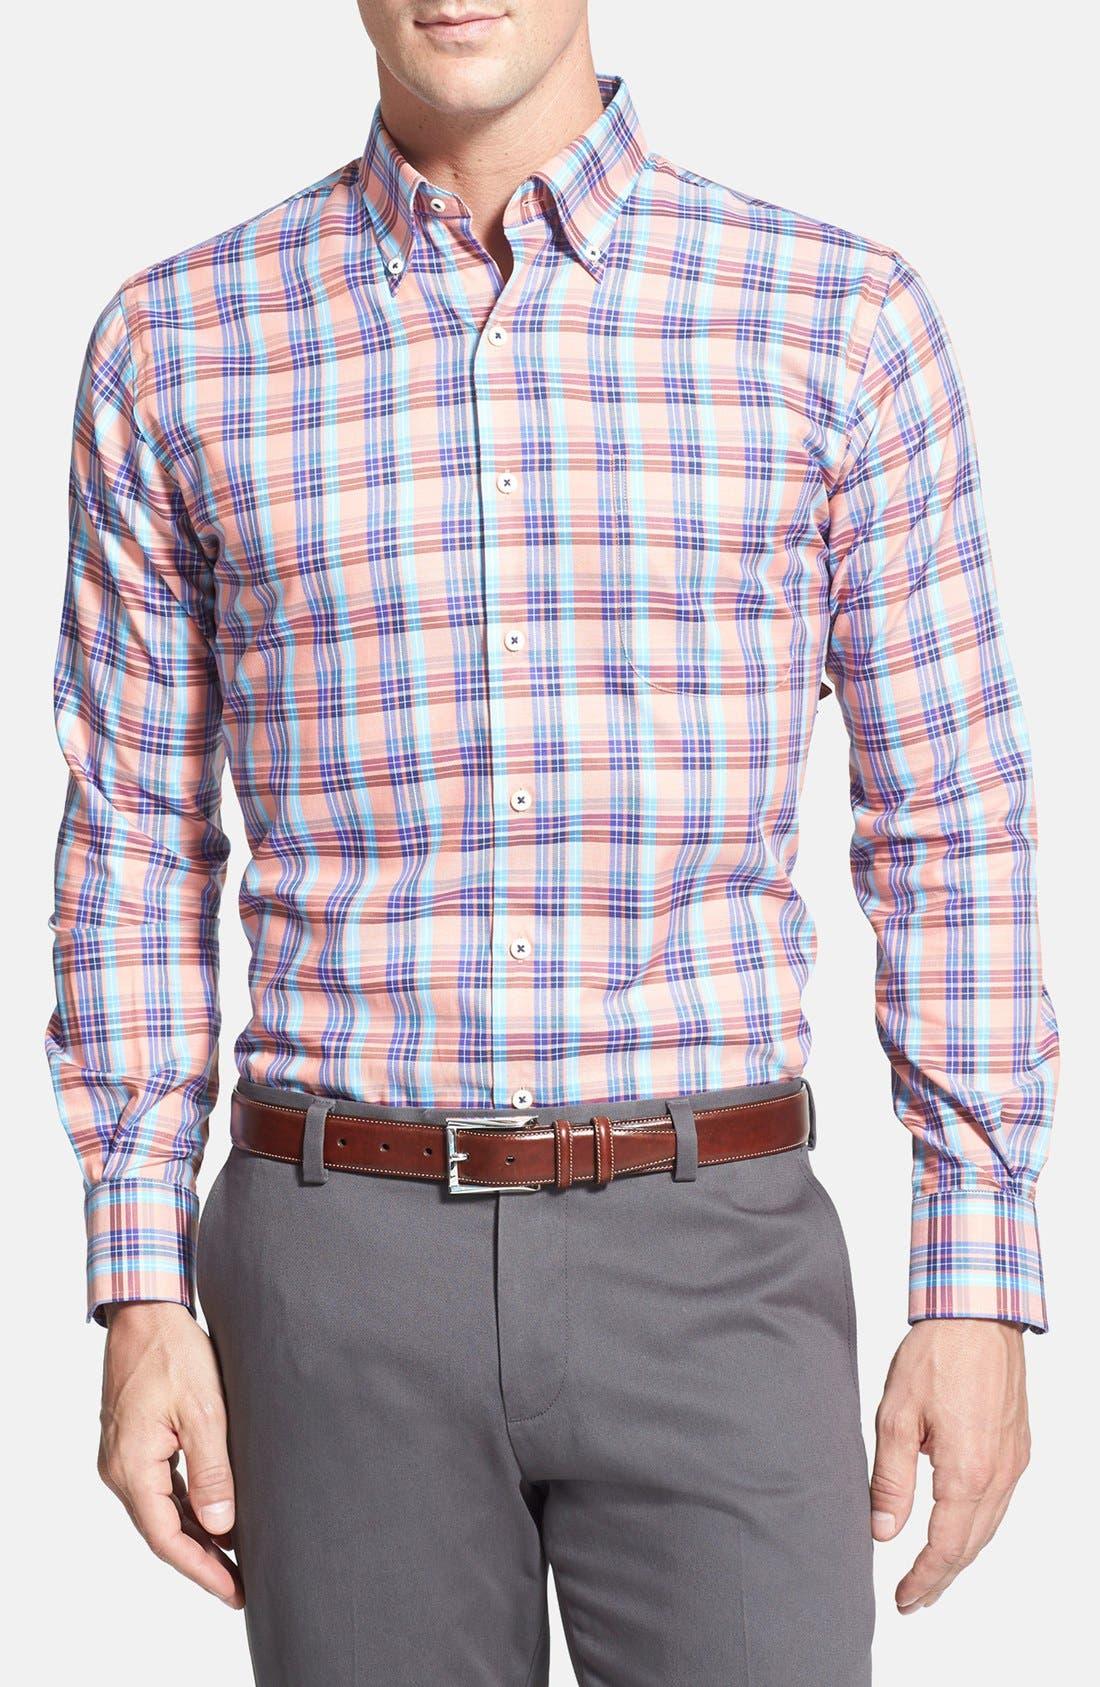 Alternate Image 1 Selected - Peter Millar 'Carmel Pane' Regular Fit Sport Shirt